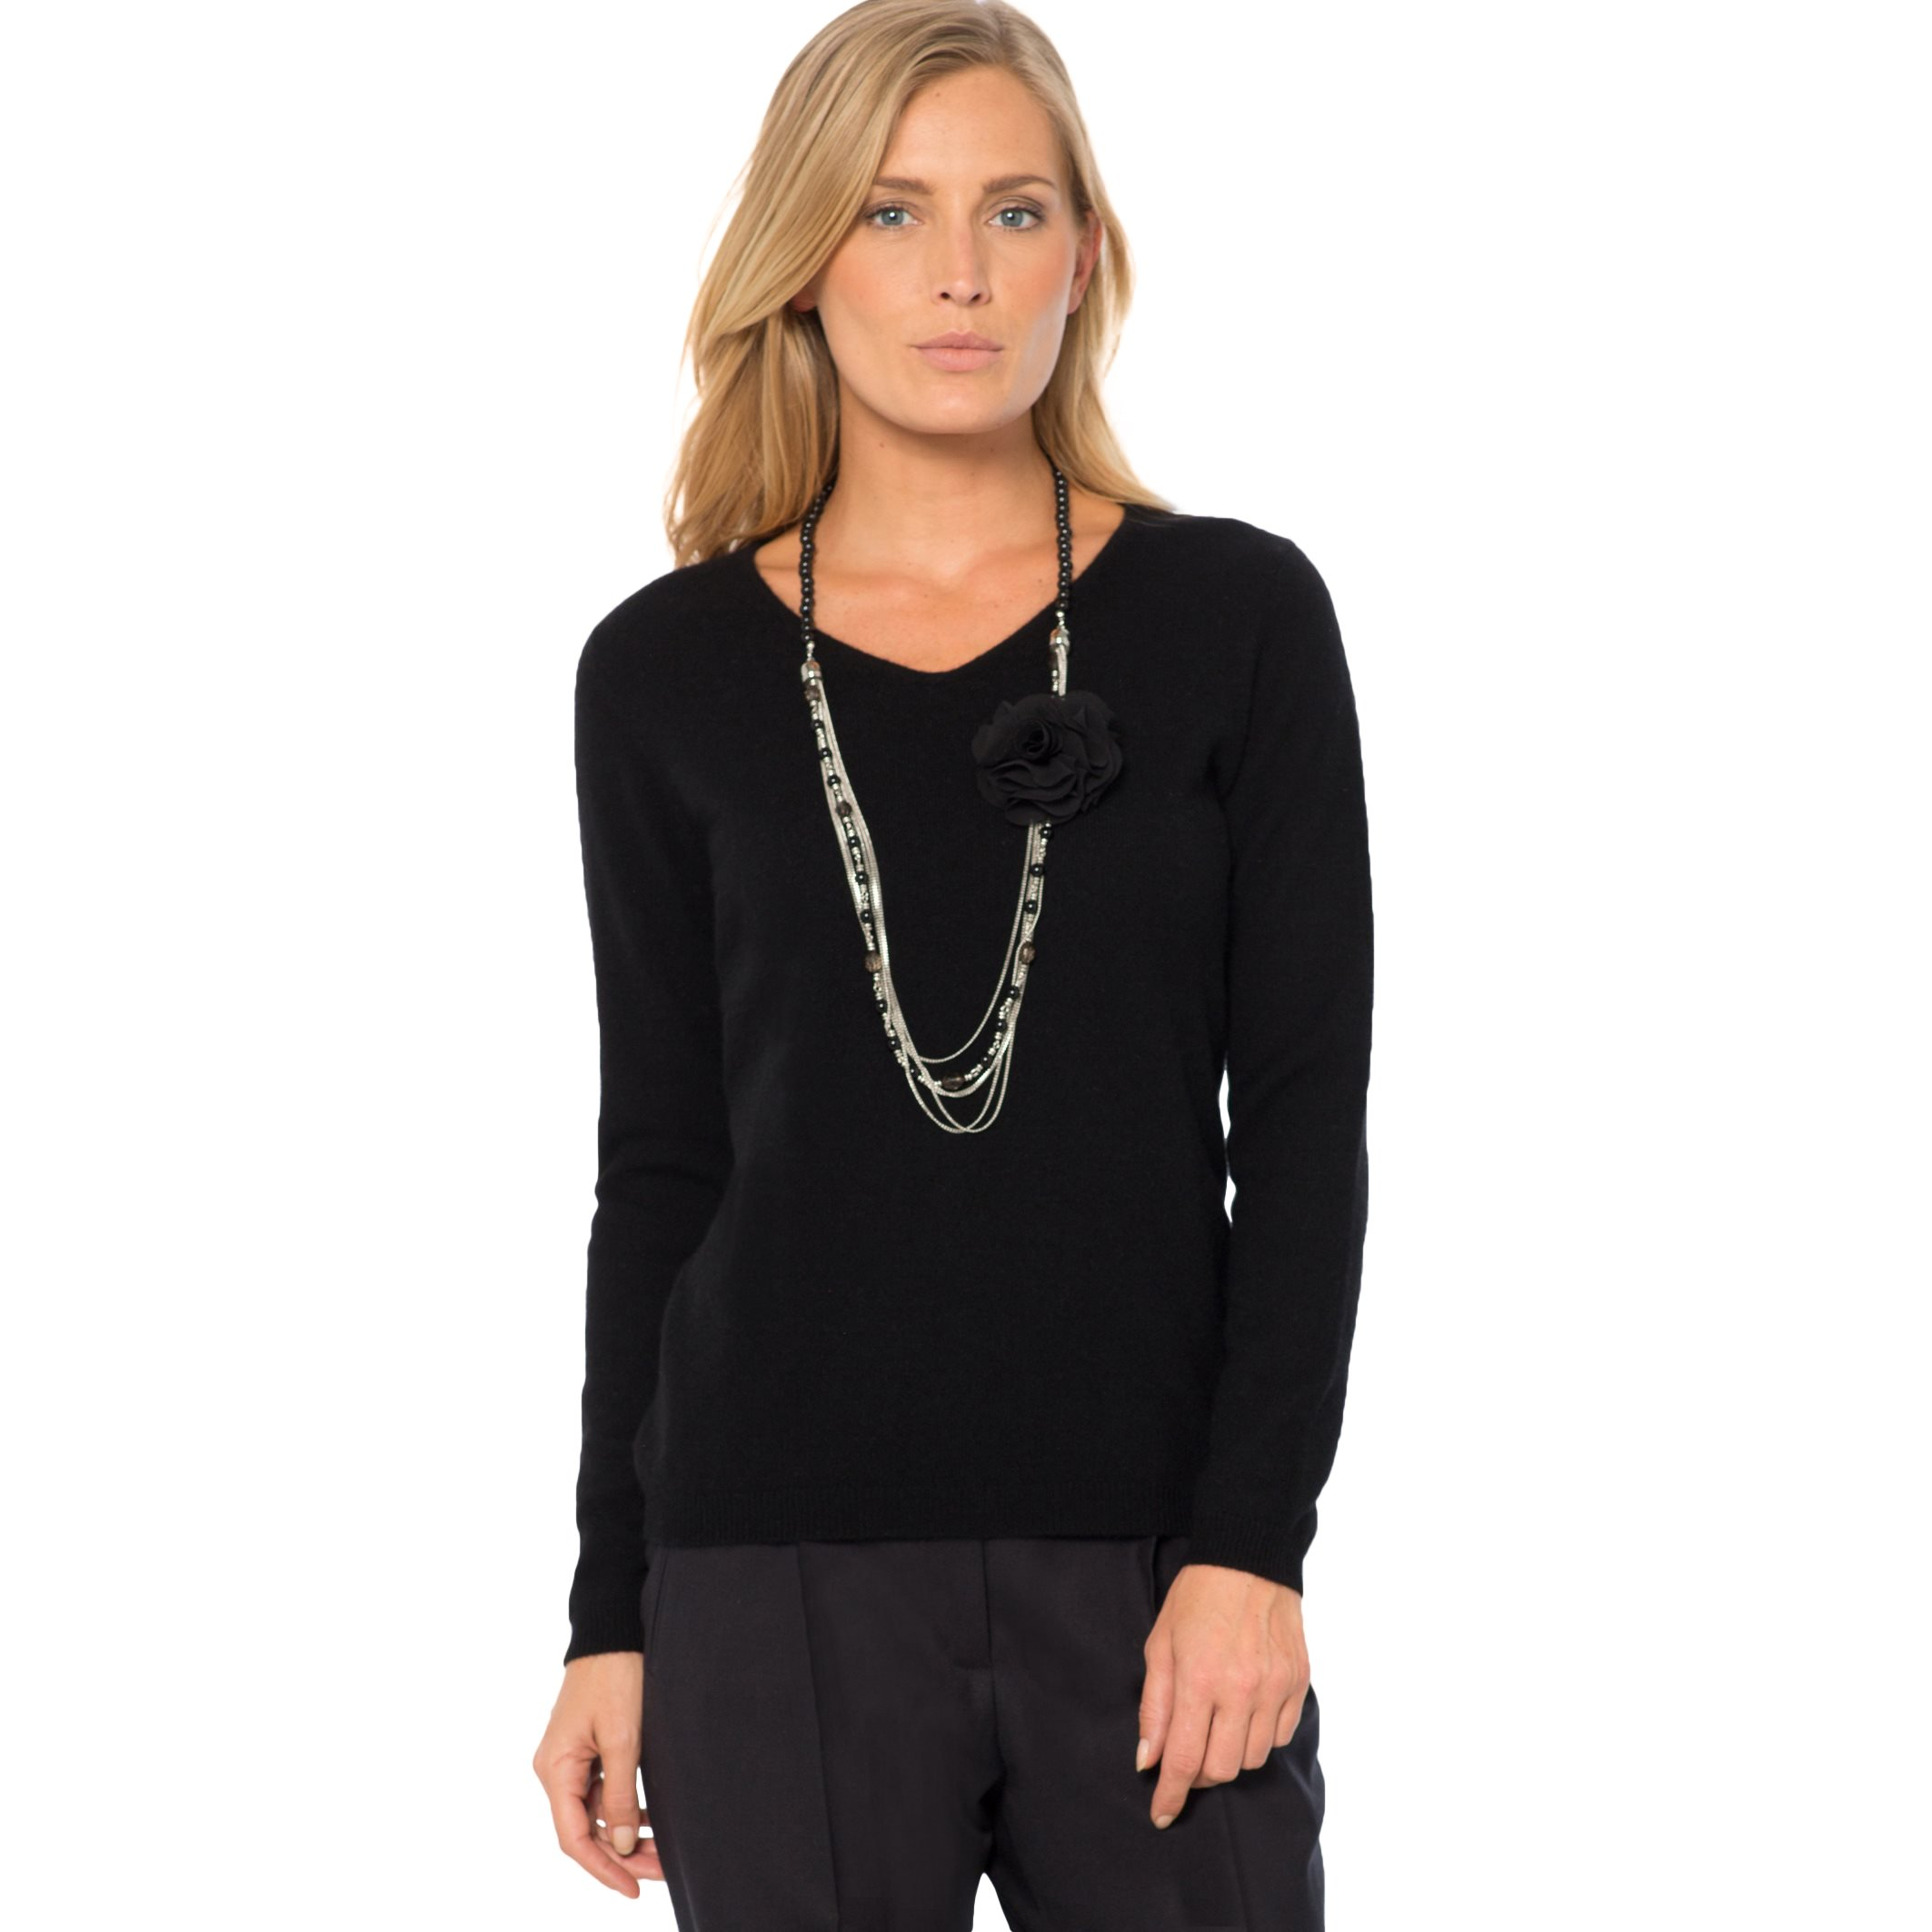 La Redoute Womens Fine Knit Cashmere V-Neck Jumper/Sweater Black Size Us 16/18 - Fr 46/48